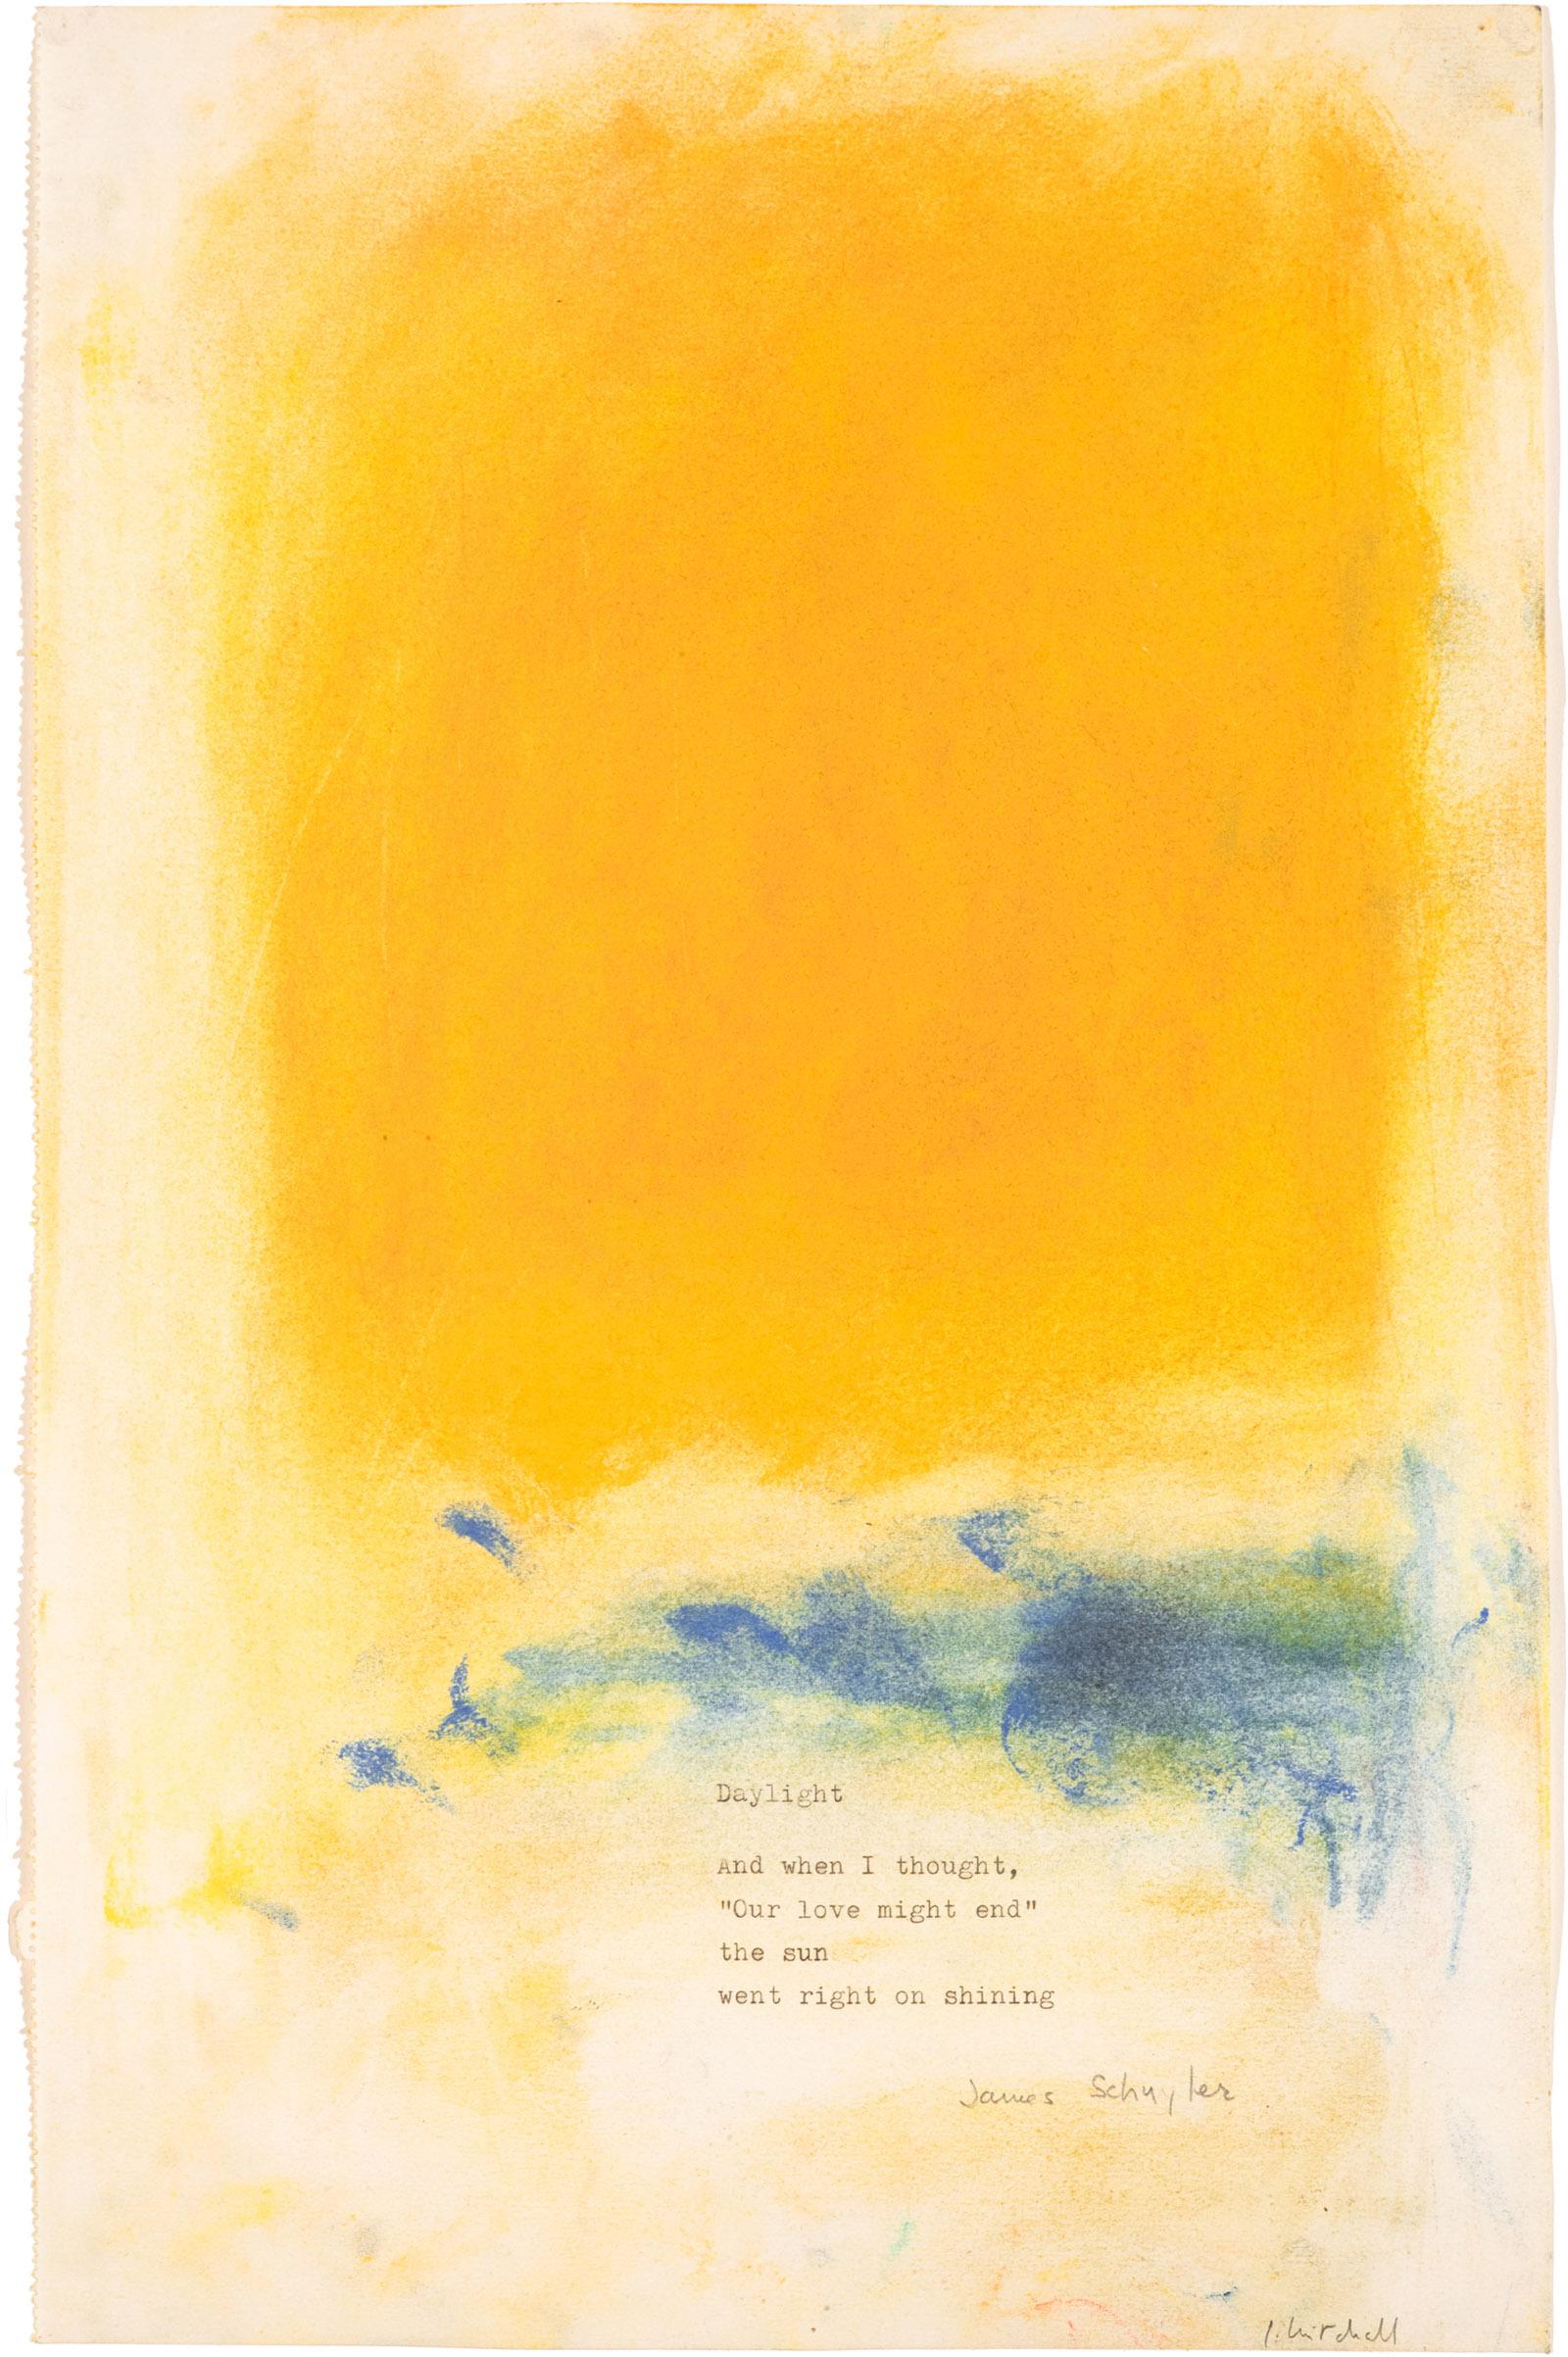 Daylight, poem-pastel; artwork by Joan Mitchell and James Schuyler